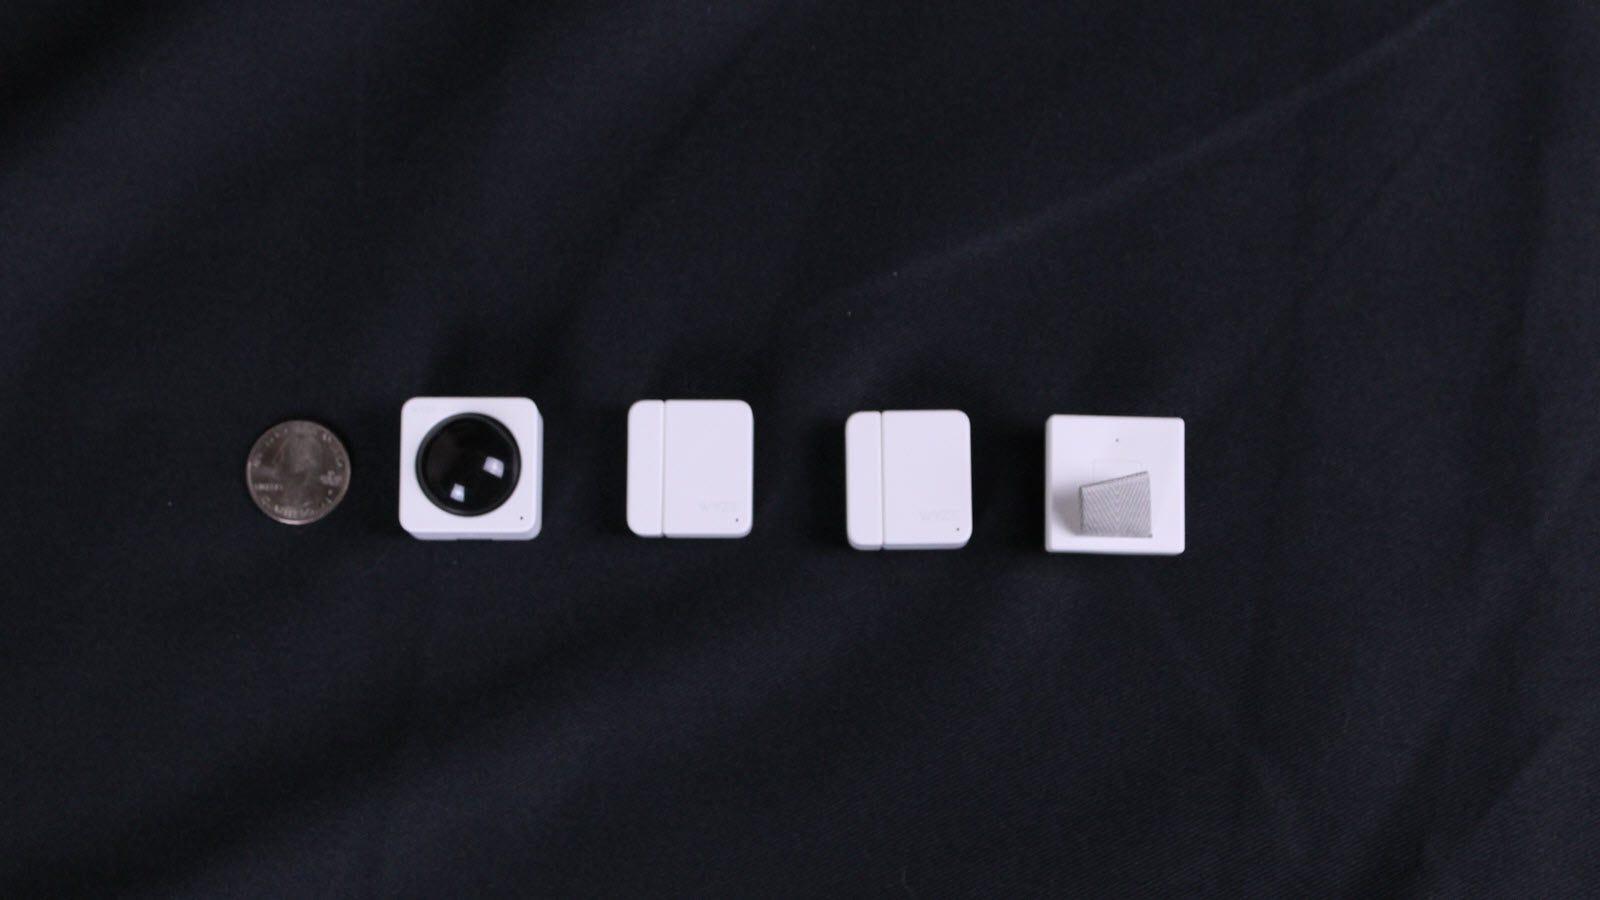 Wyze Sense nexto to a quarter, showing a comparable size.